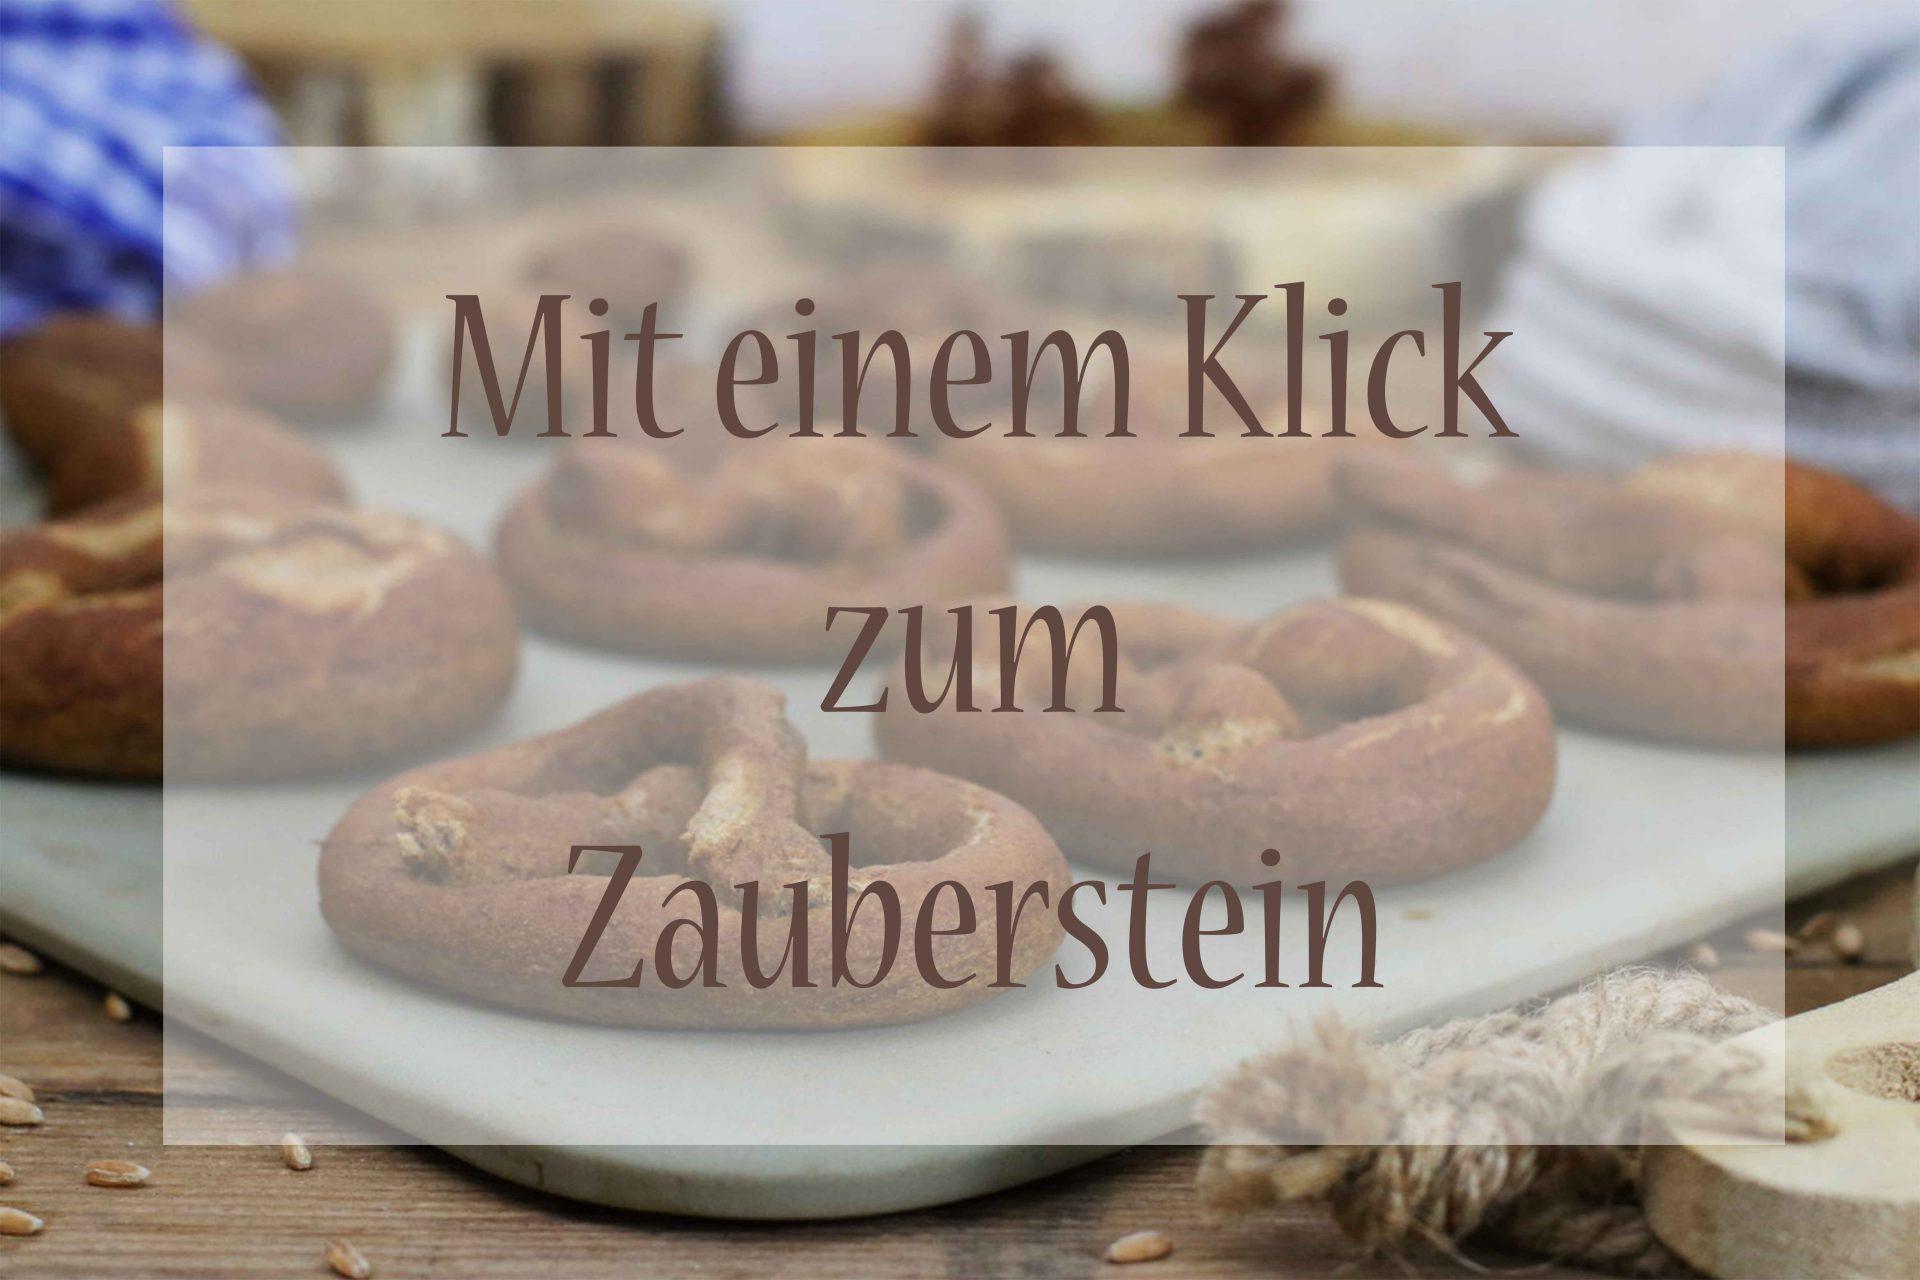 Zauberstein Foodrevers Pampered Chef Clean Eating